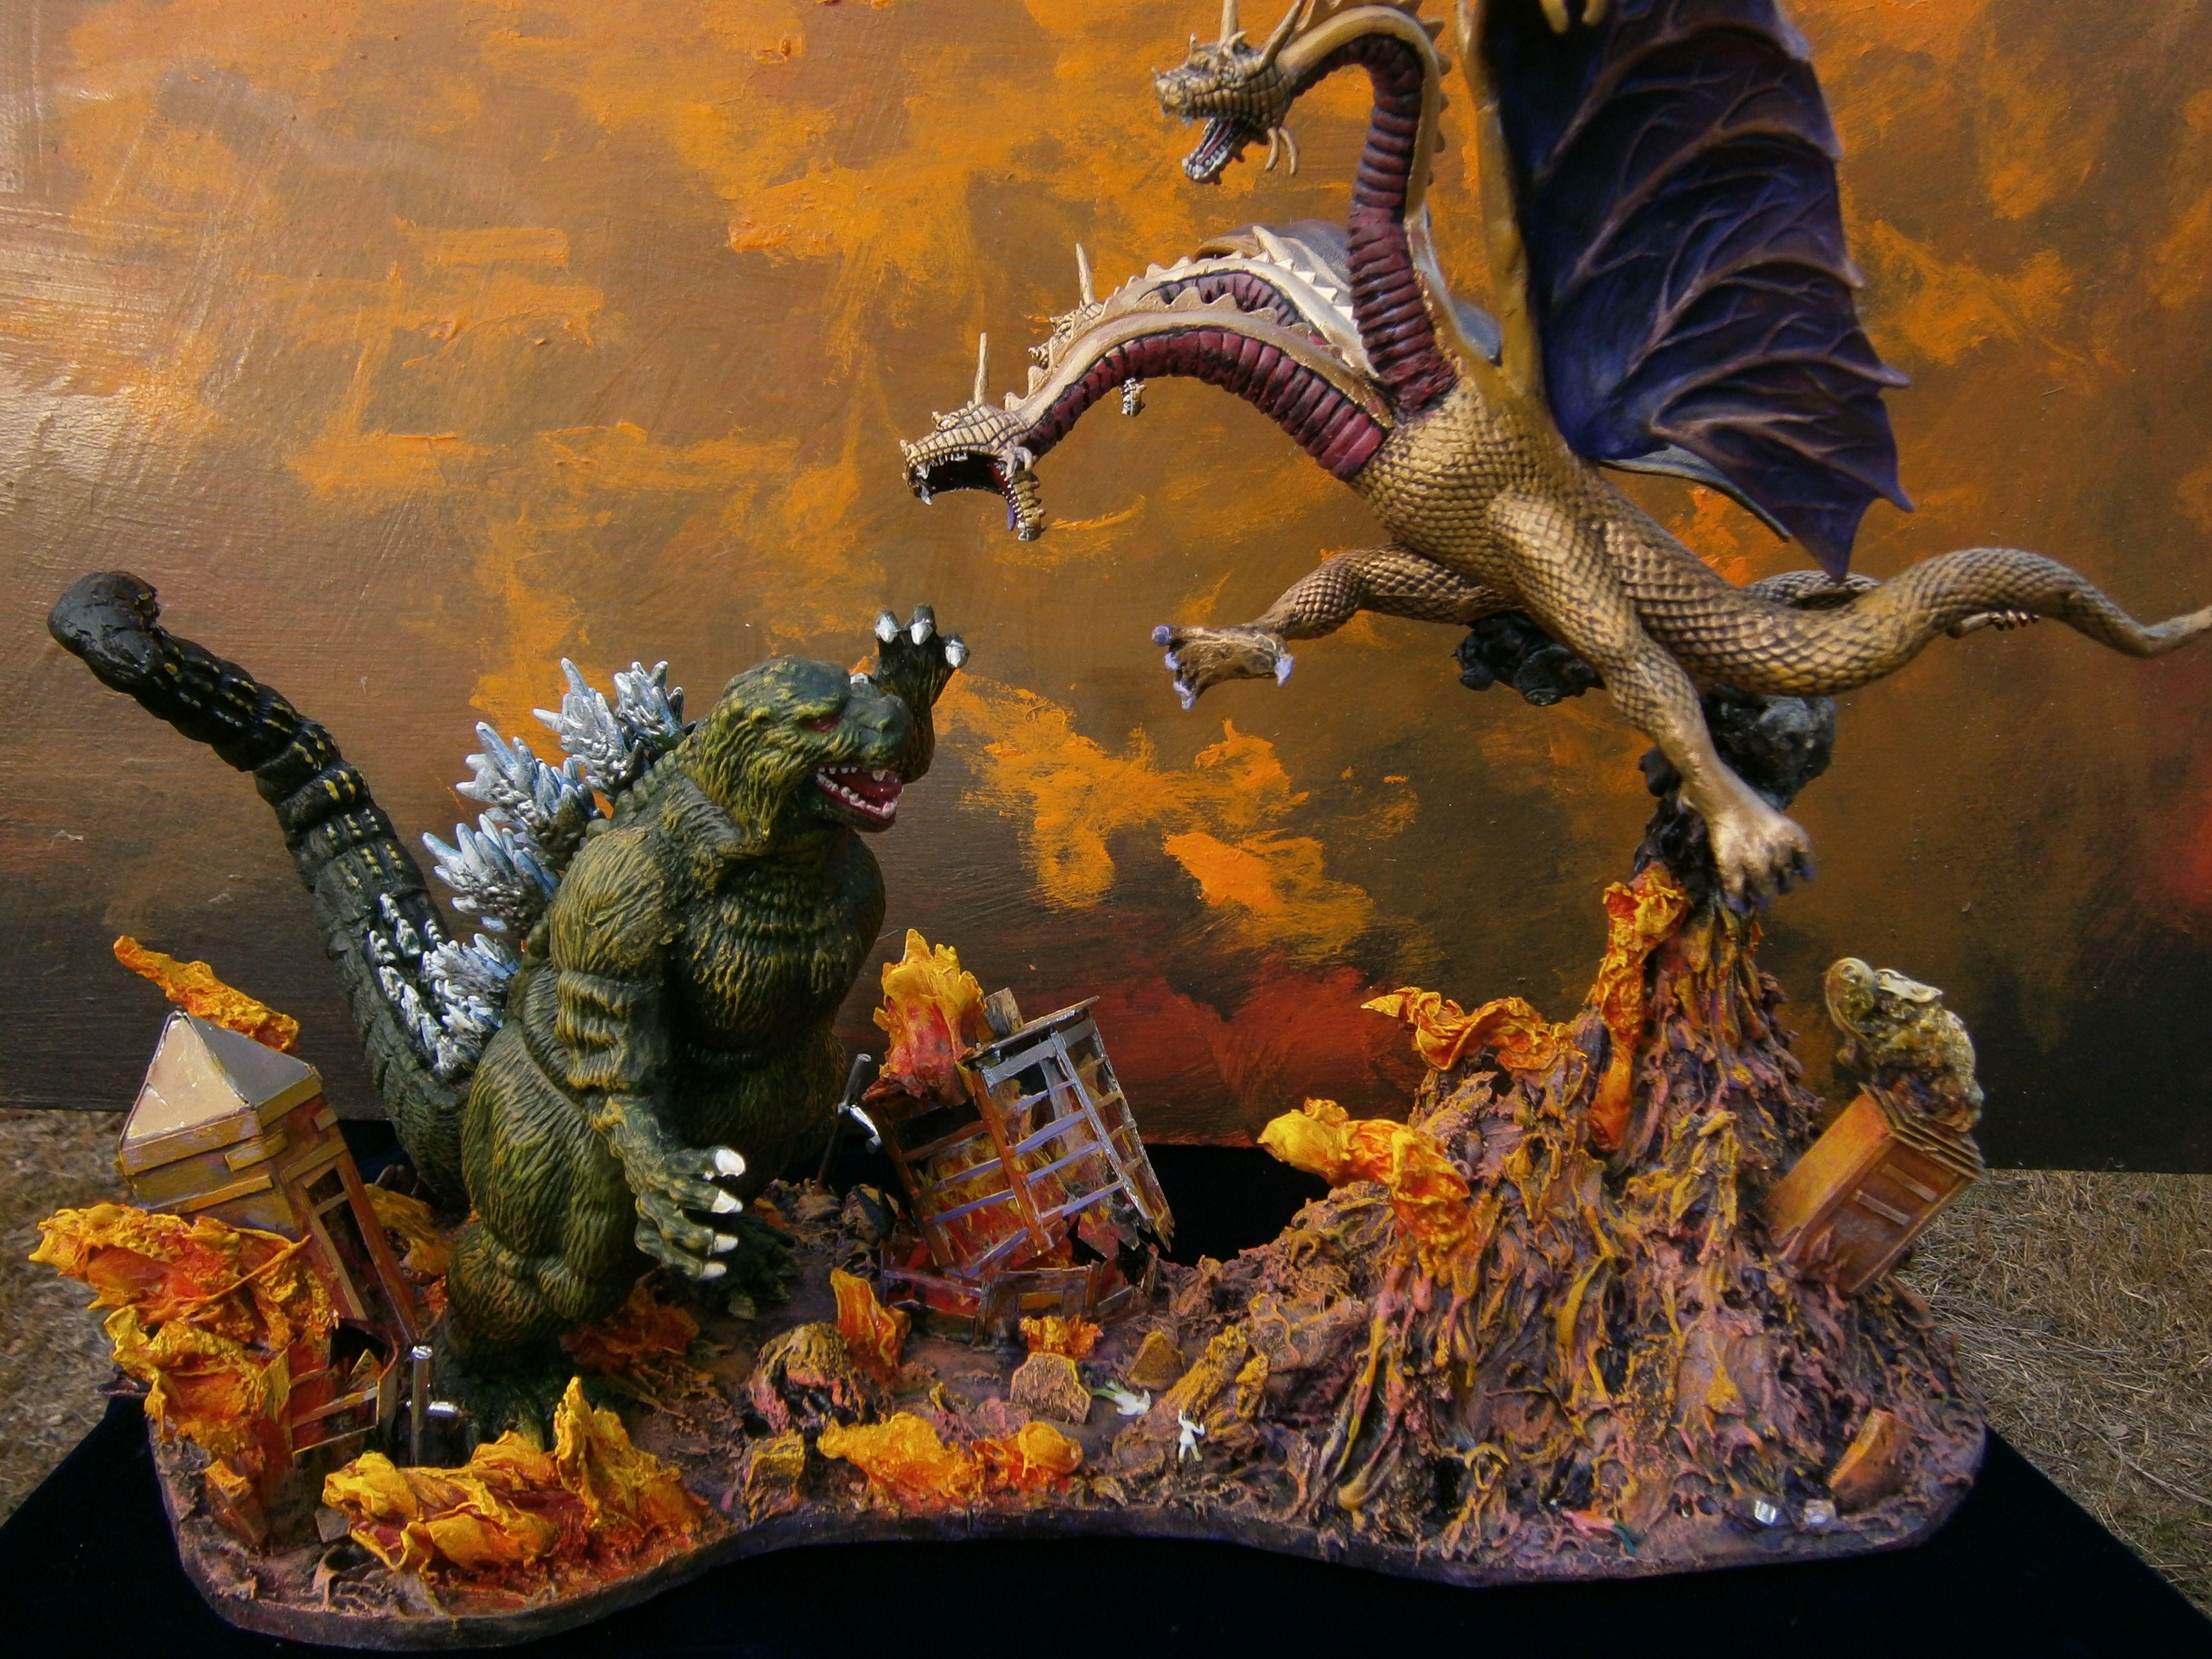 Godzilla vs King Ghidorah 4k Ultra HD Wallpaper Background 4288x3216